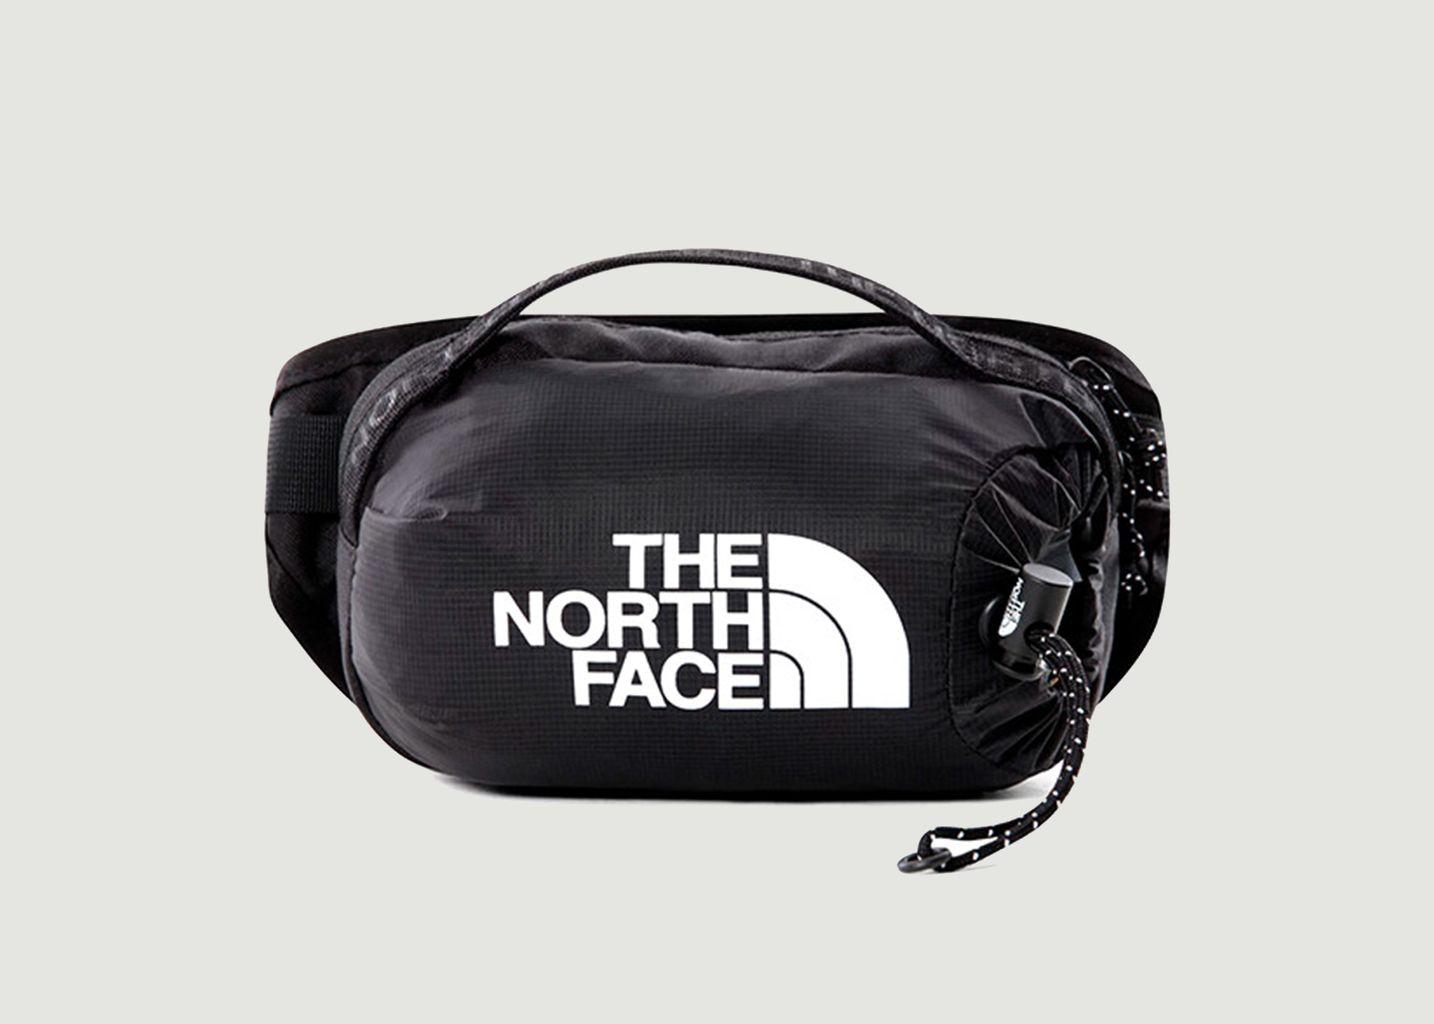 Sac Banane Bozer - The North Face